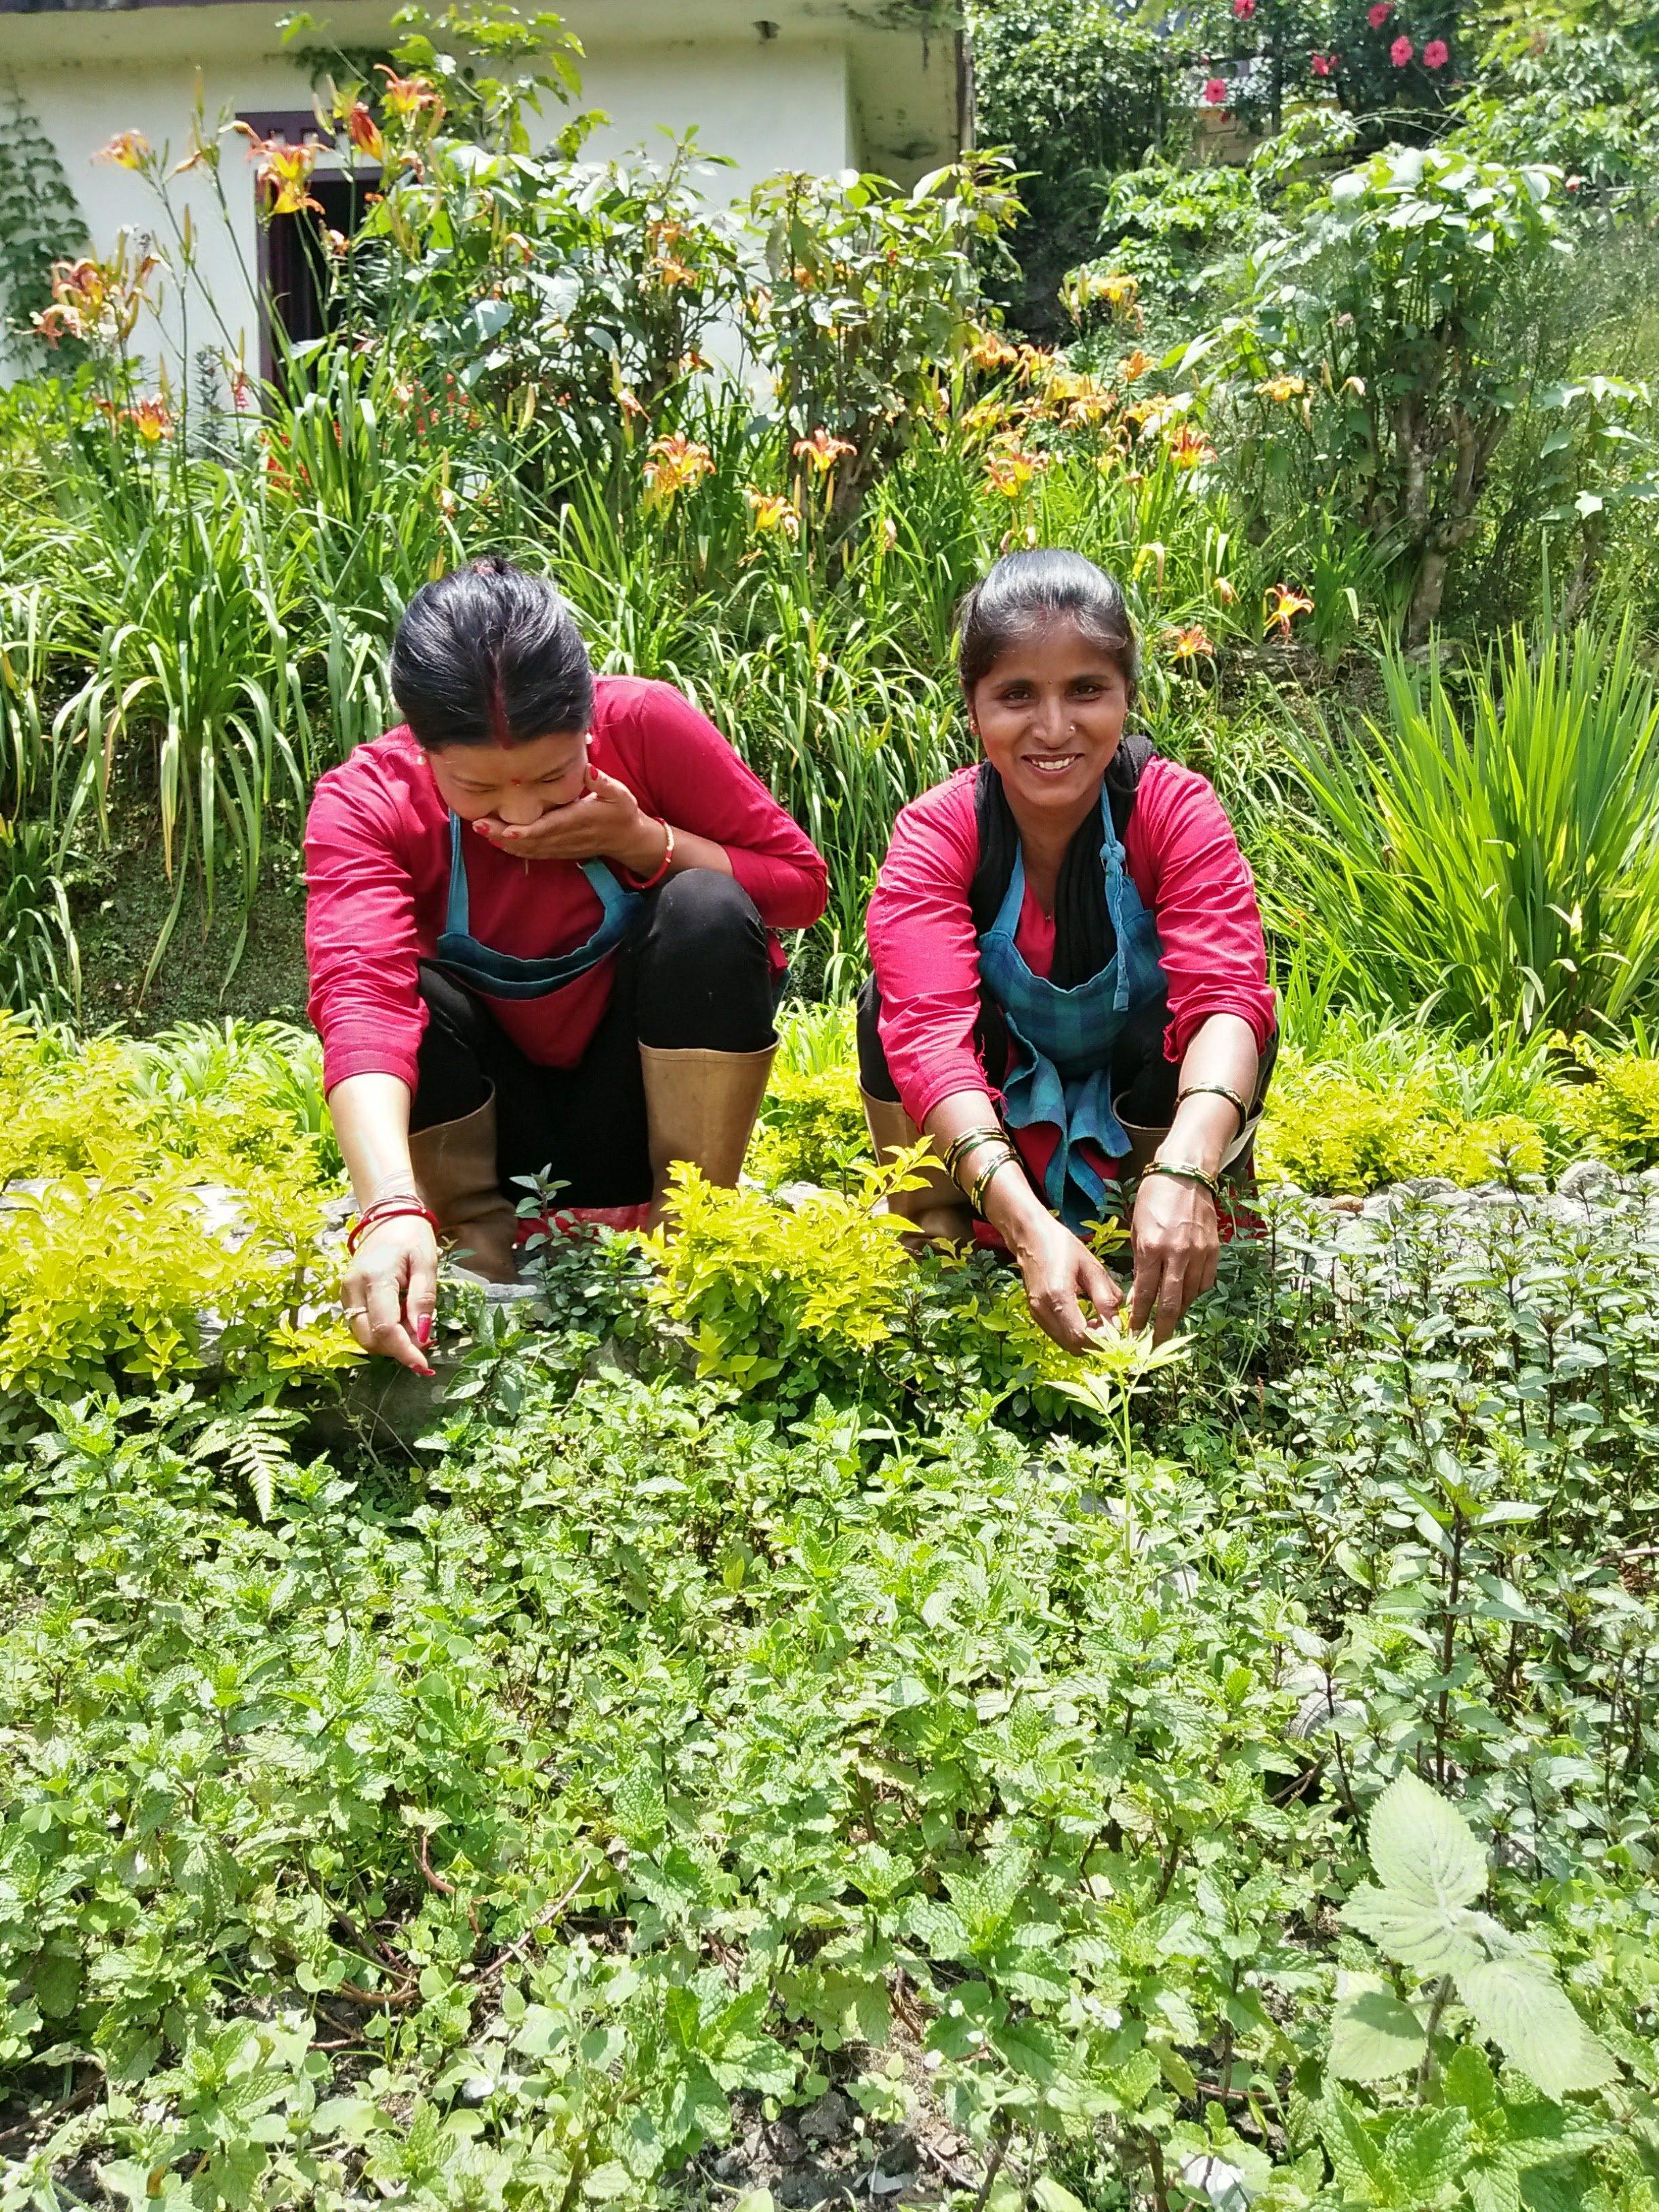 Fresh Herbal Tea, Mint Harvesting